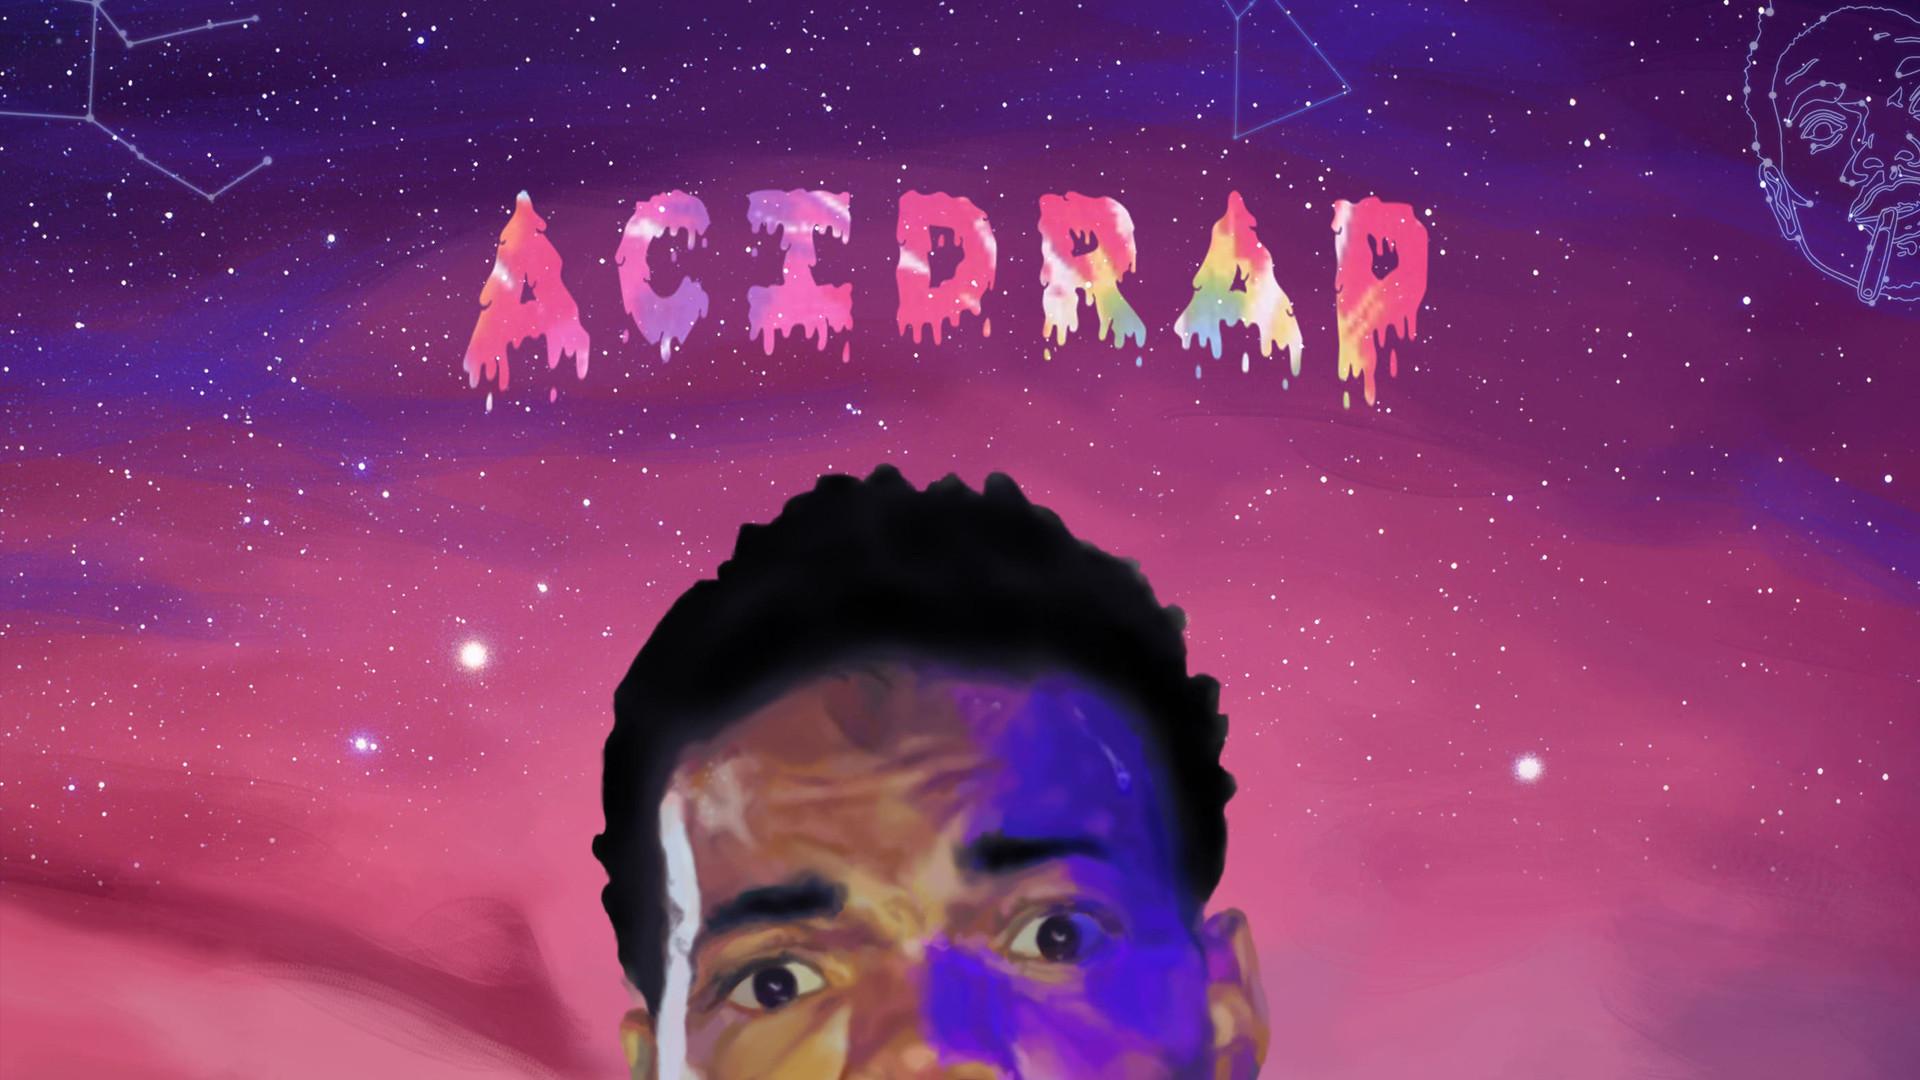 Acid Rap Chance The Rapper Wallpaper Chance the rapper acid rap